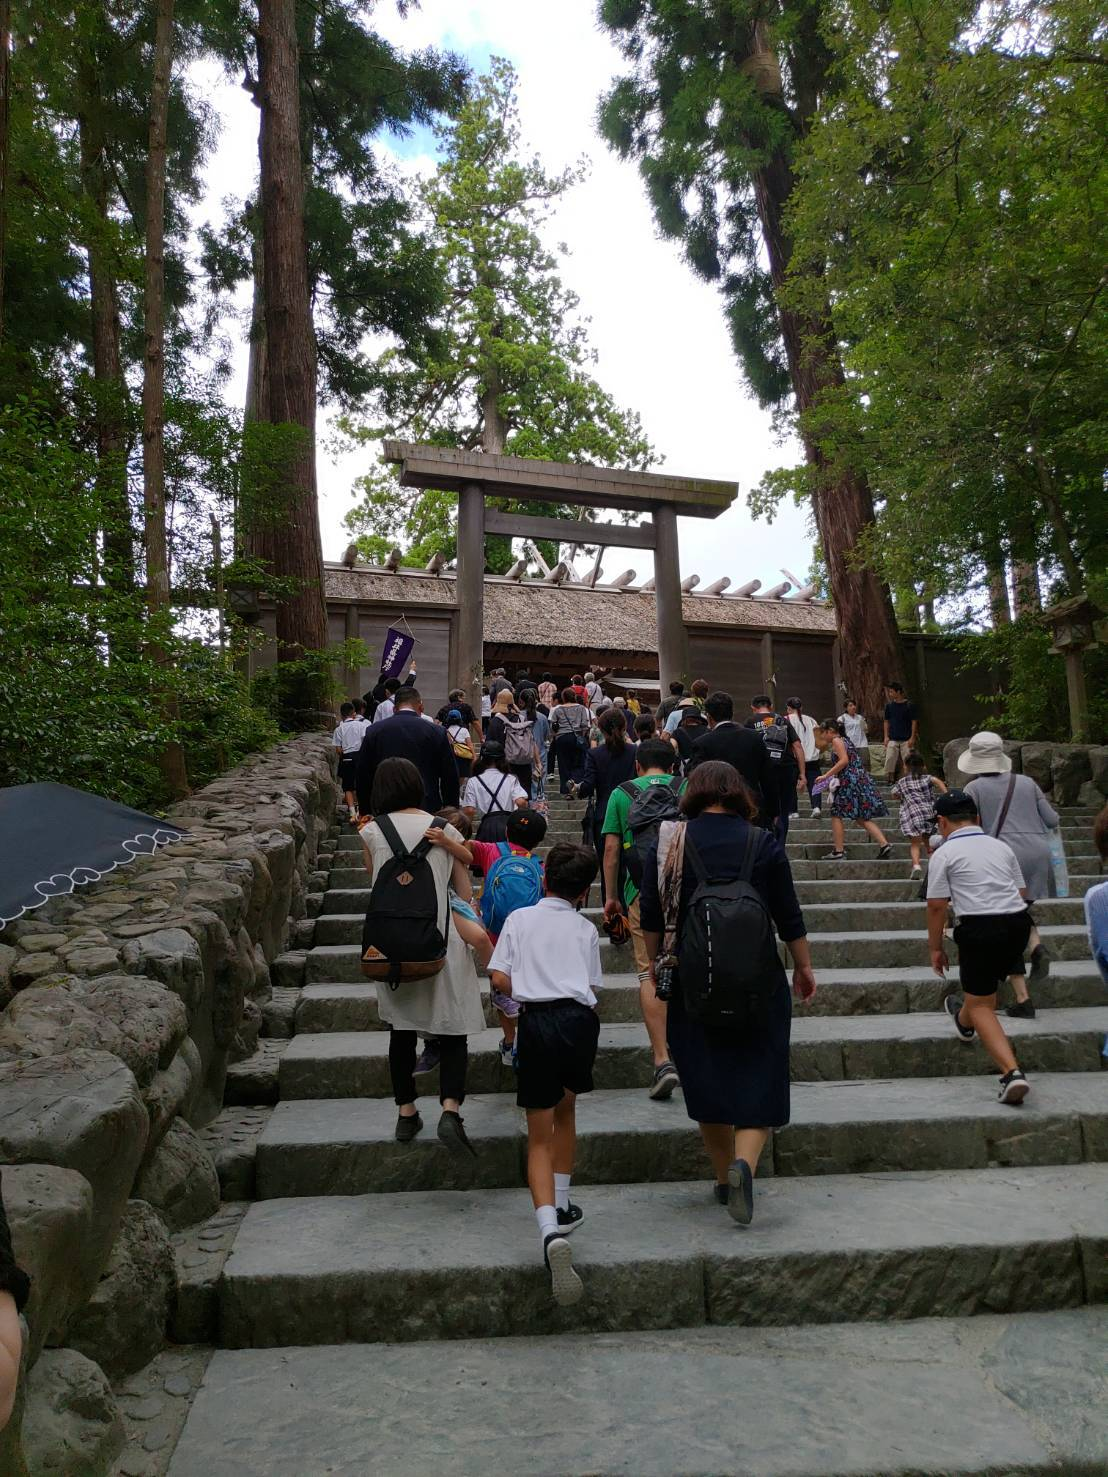 第15回親子で行く伊勢神宮参拝旅行_f0136366_13411885.jpg